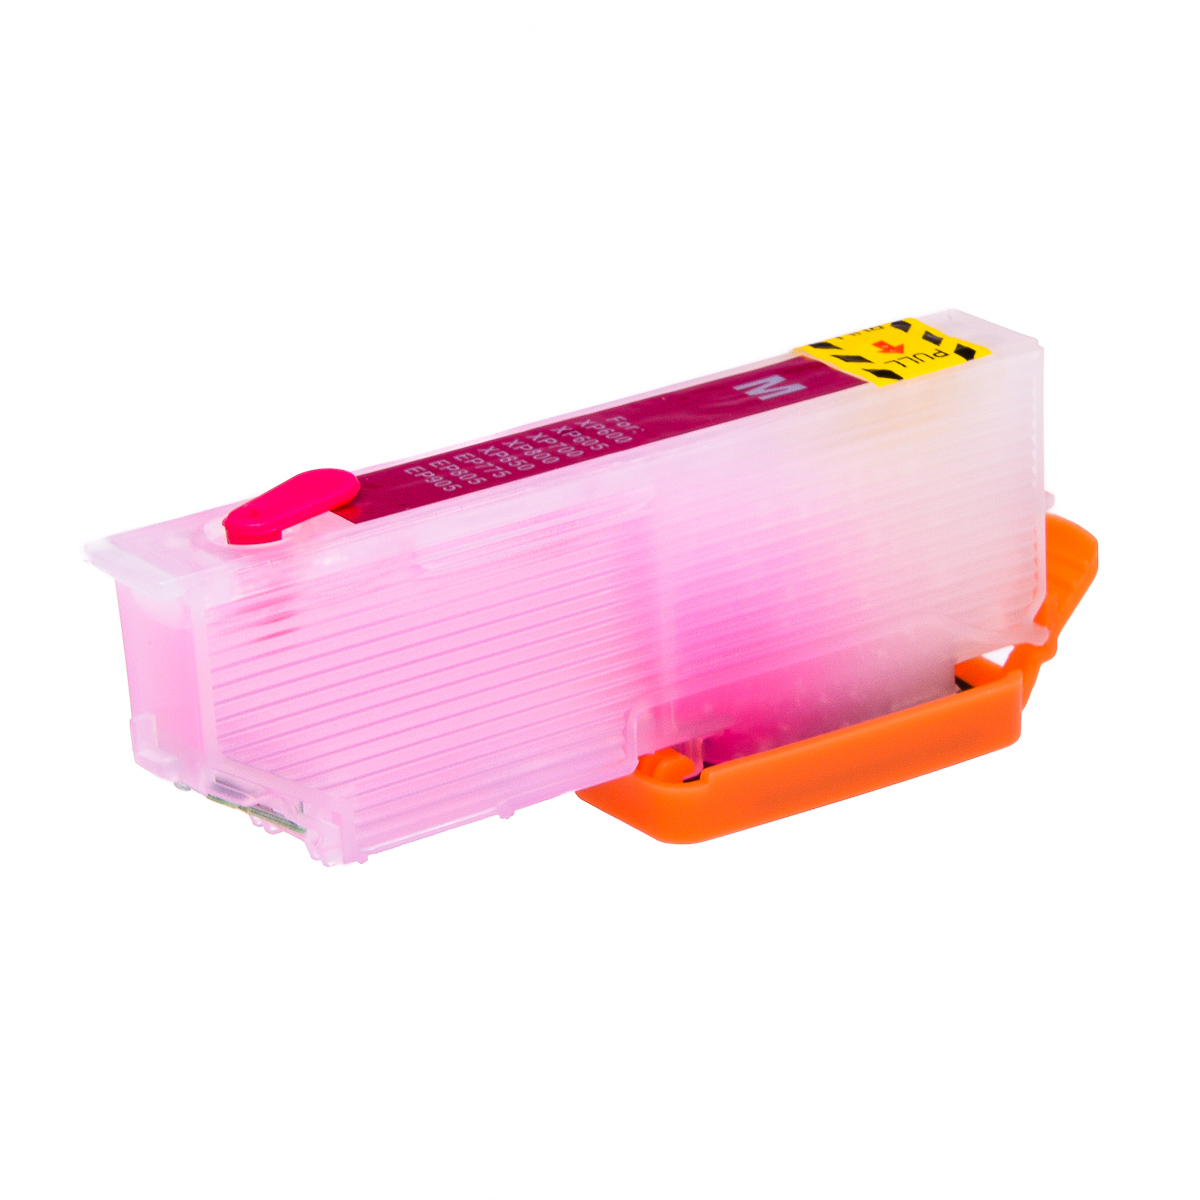 Magenta printhead cleaning cartridge for Epson XP-55 printer